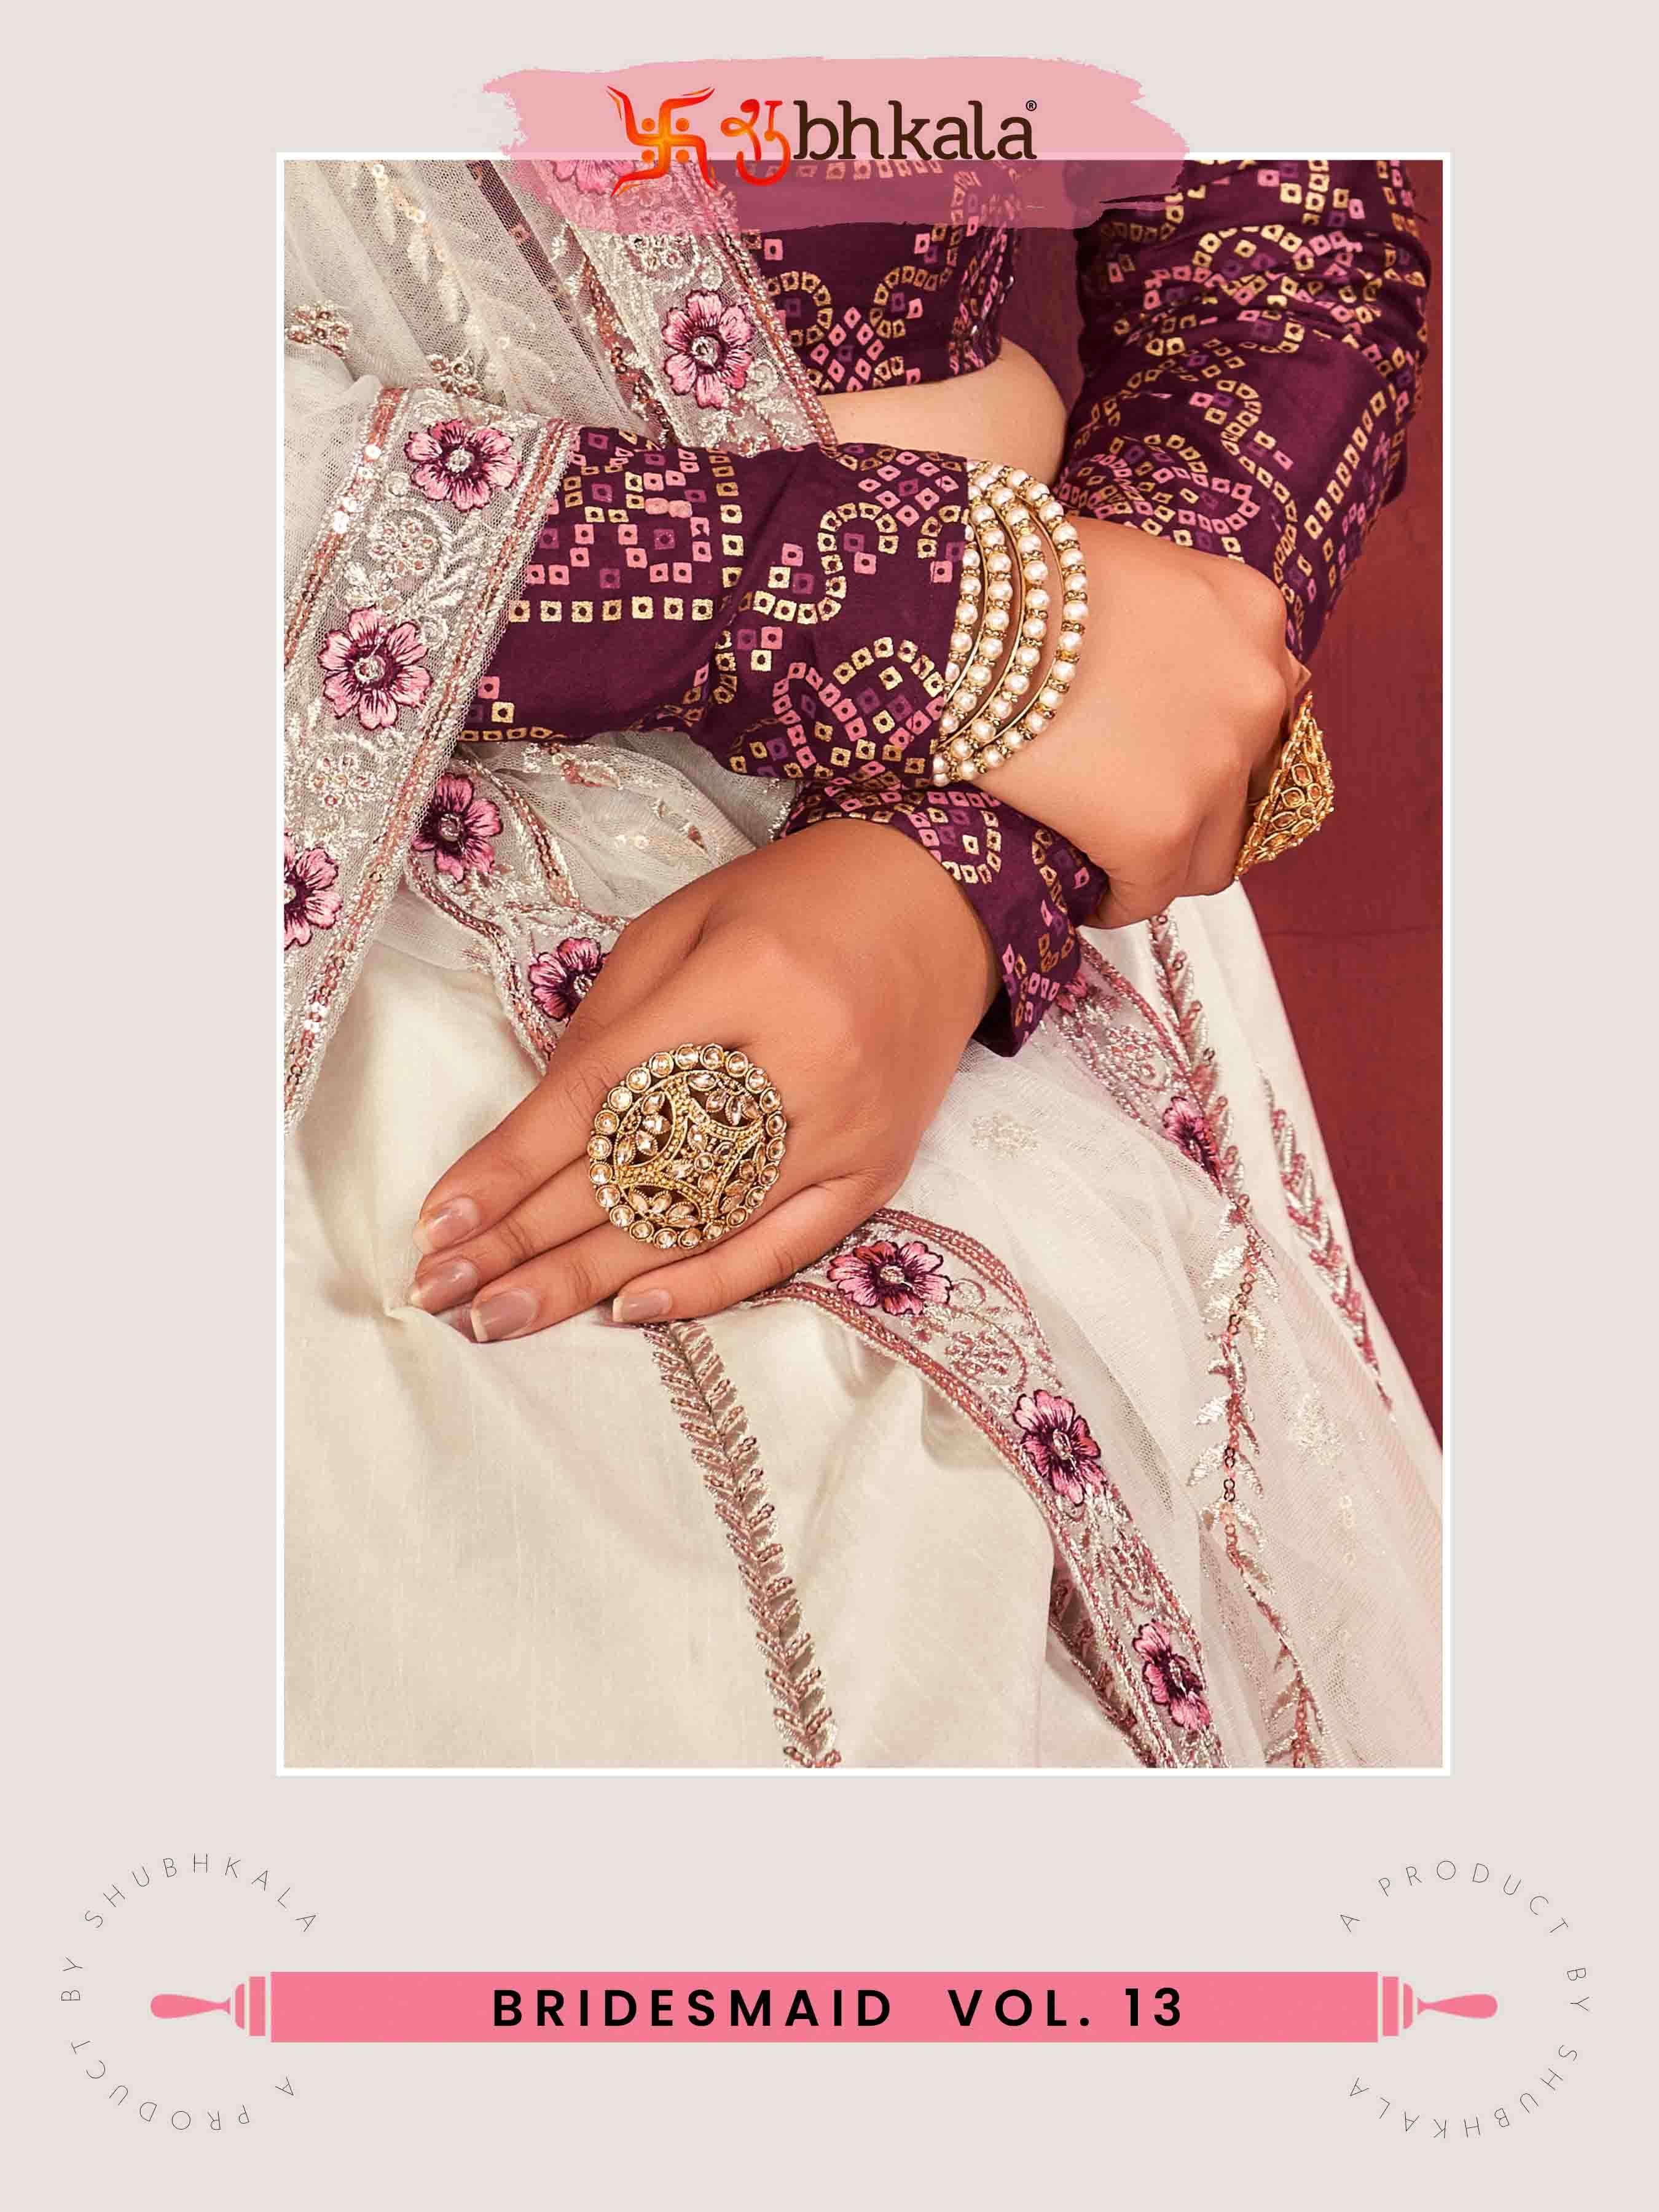 Shubhkala Bridesmaid Vol. 13 Exclusive Designer Bridal Lehenga Choli